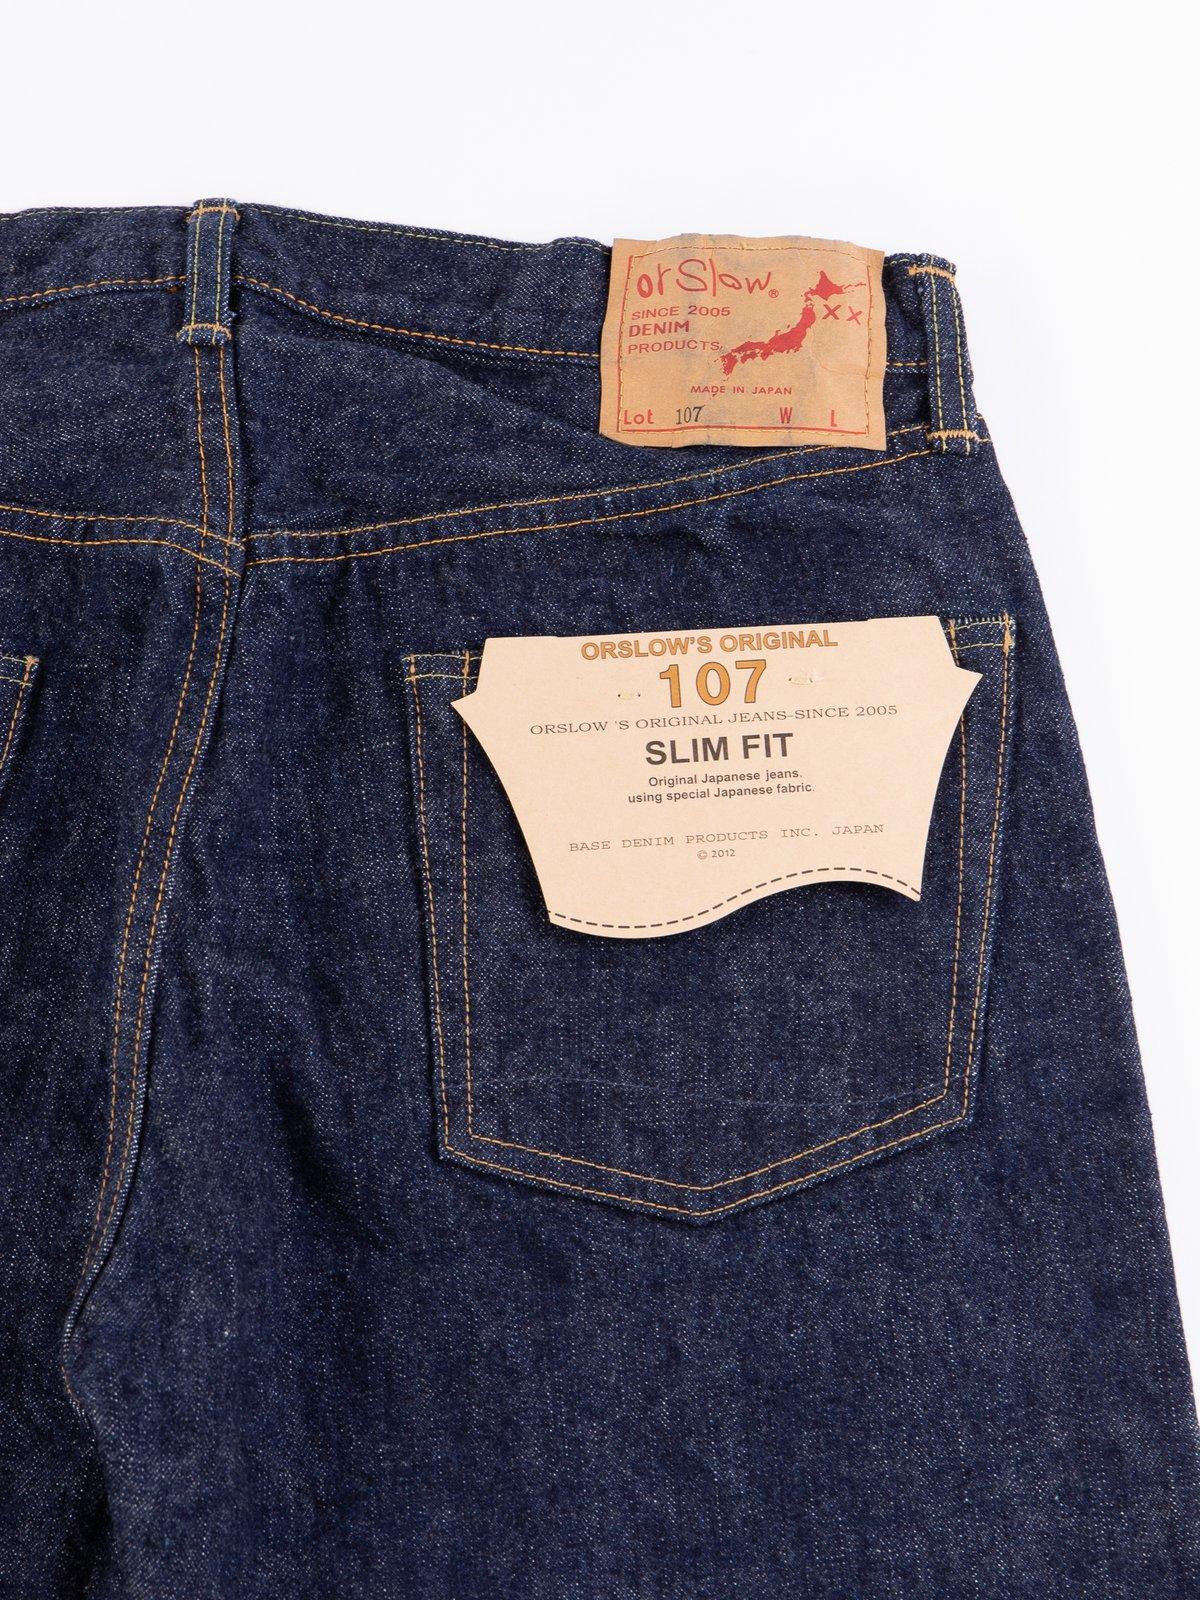 Indigo One Wash 107 Slim Fit Jean - Image 8